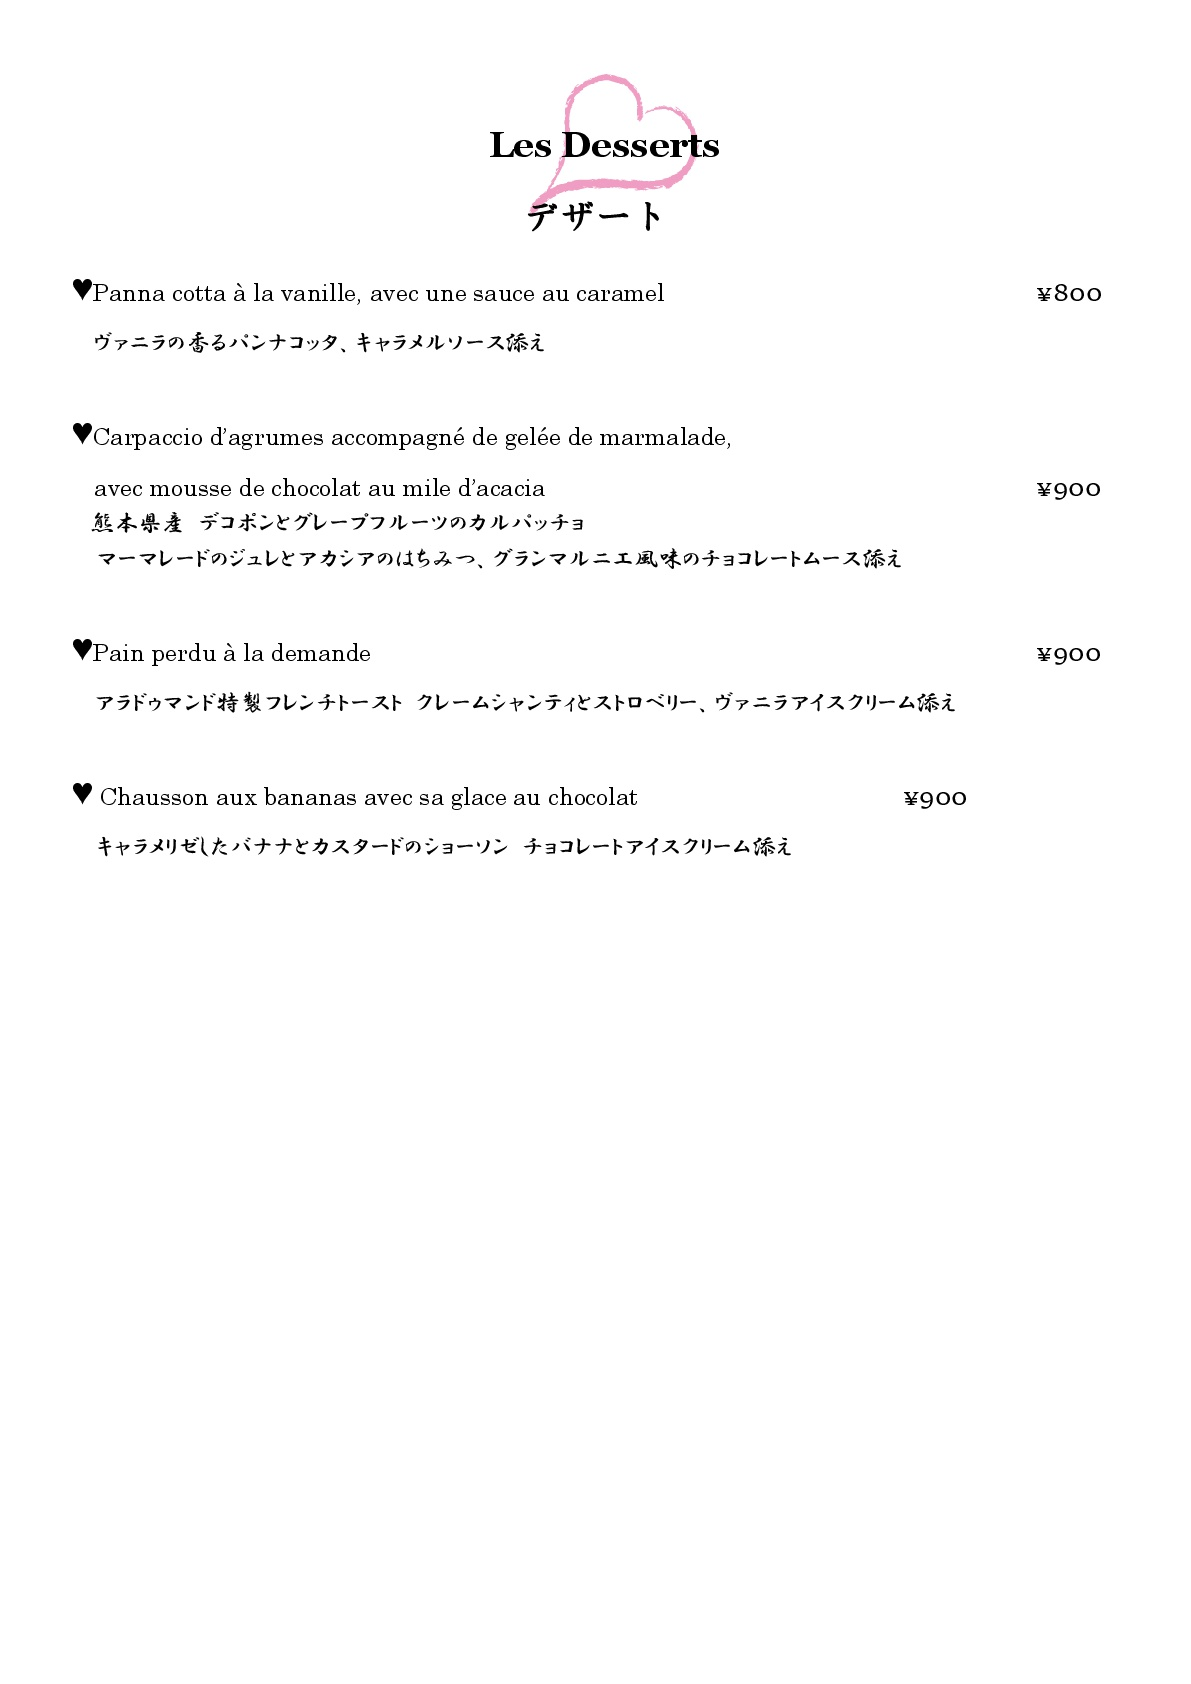 les-desserts-pdf-2018harumenyu-001